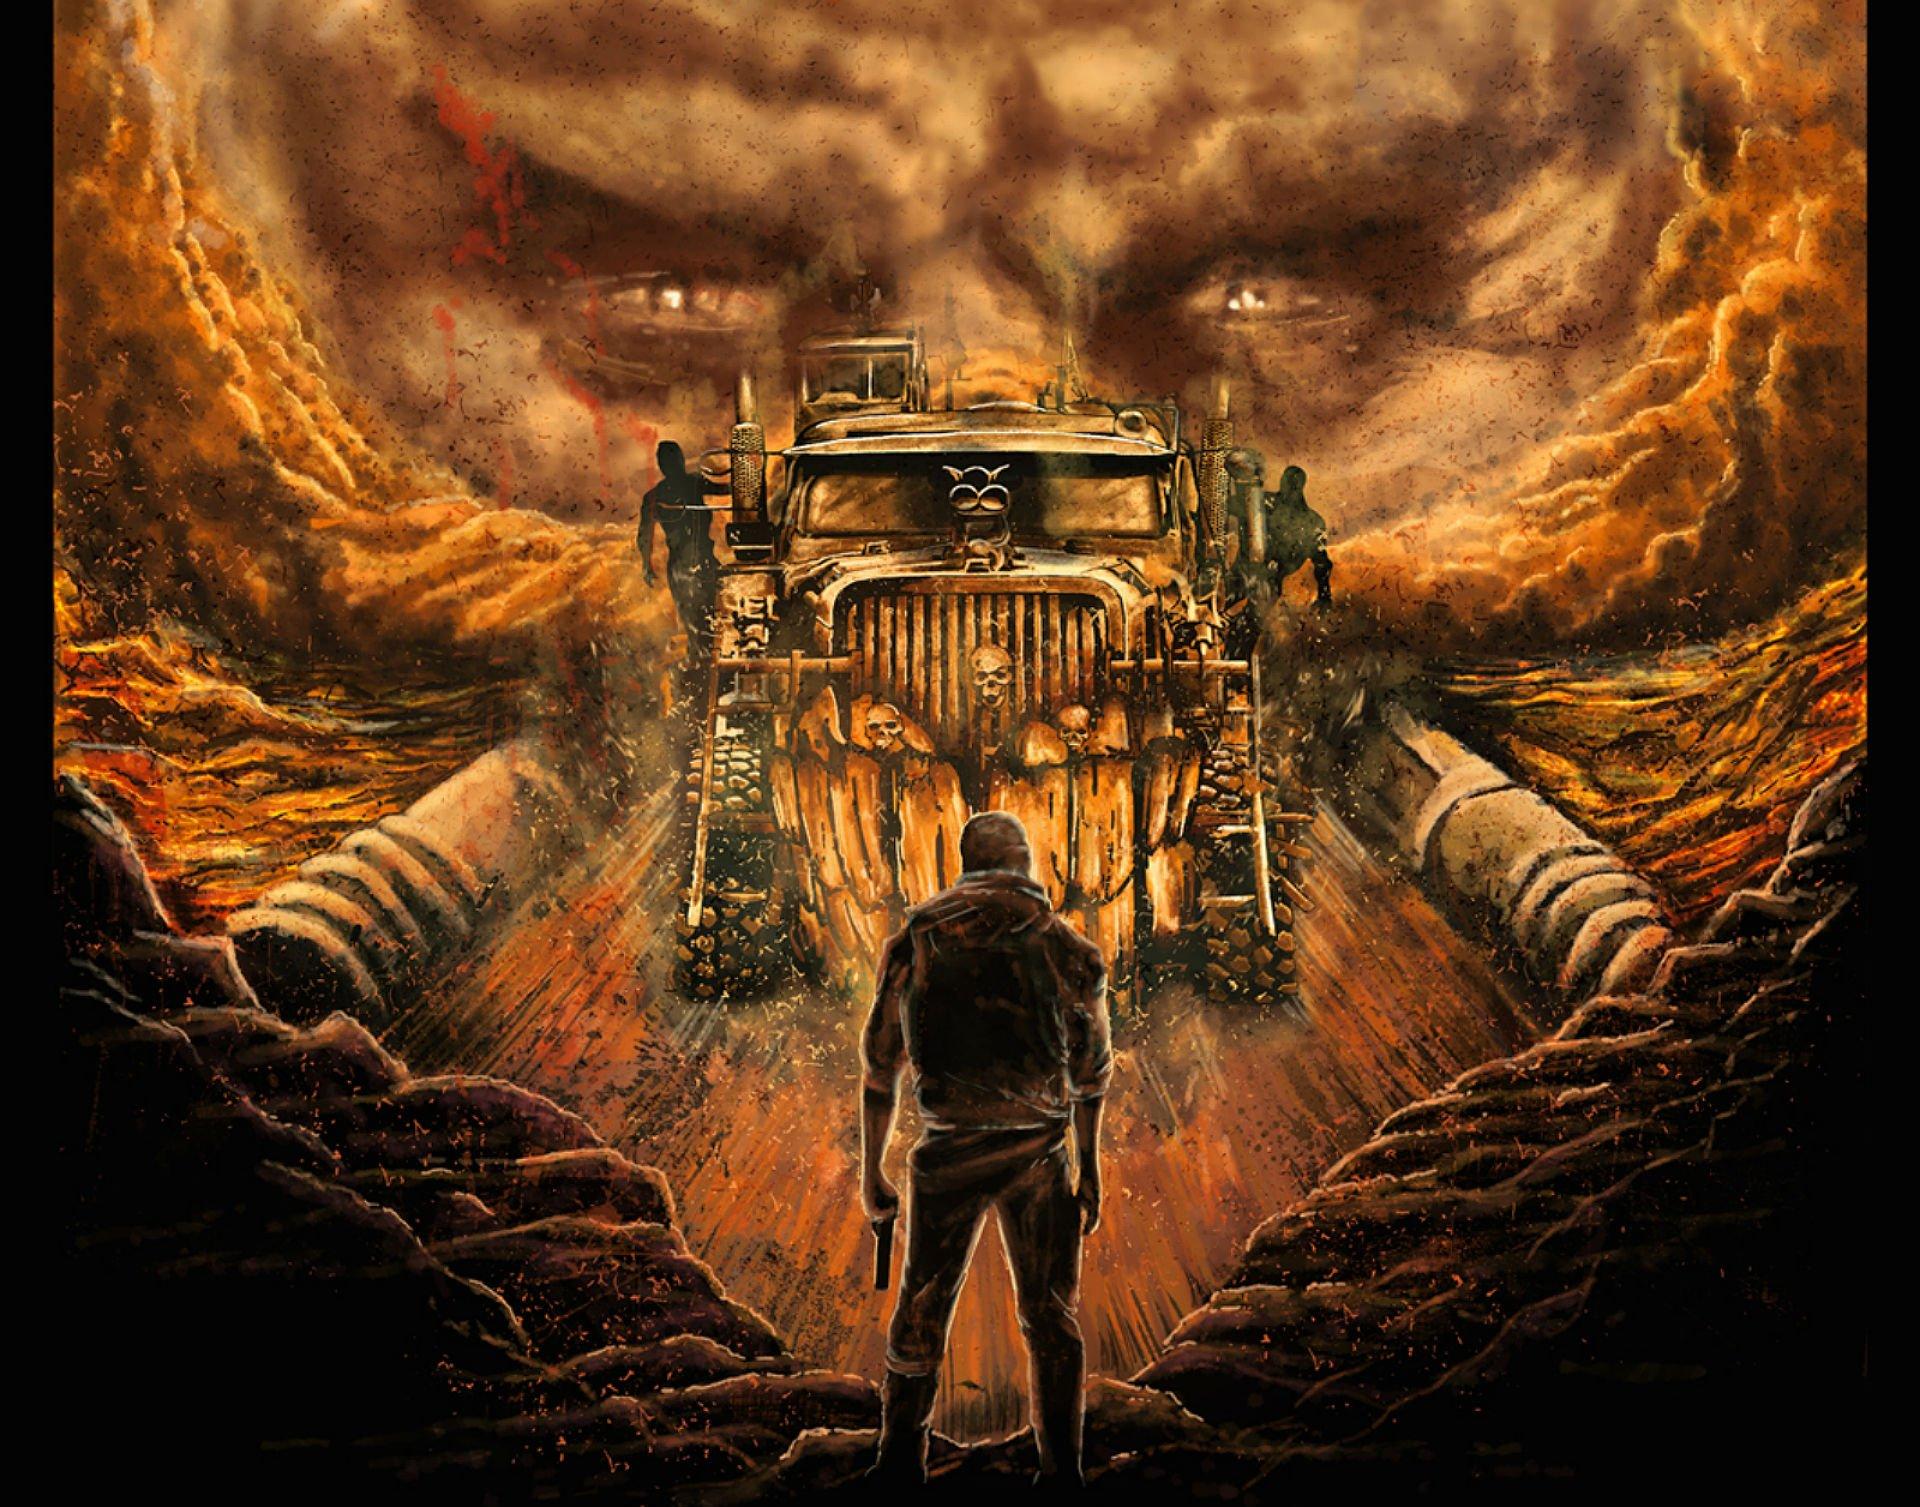 [49+] Mad Max Wallpaper Fury Road on WallpaperSafari